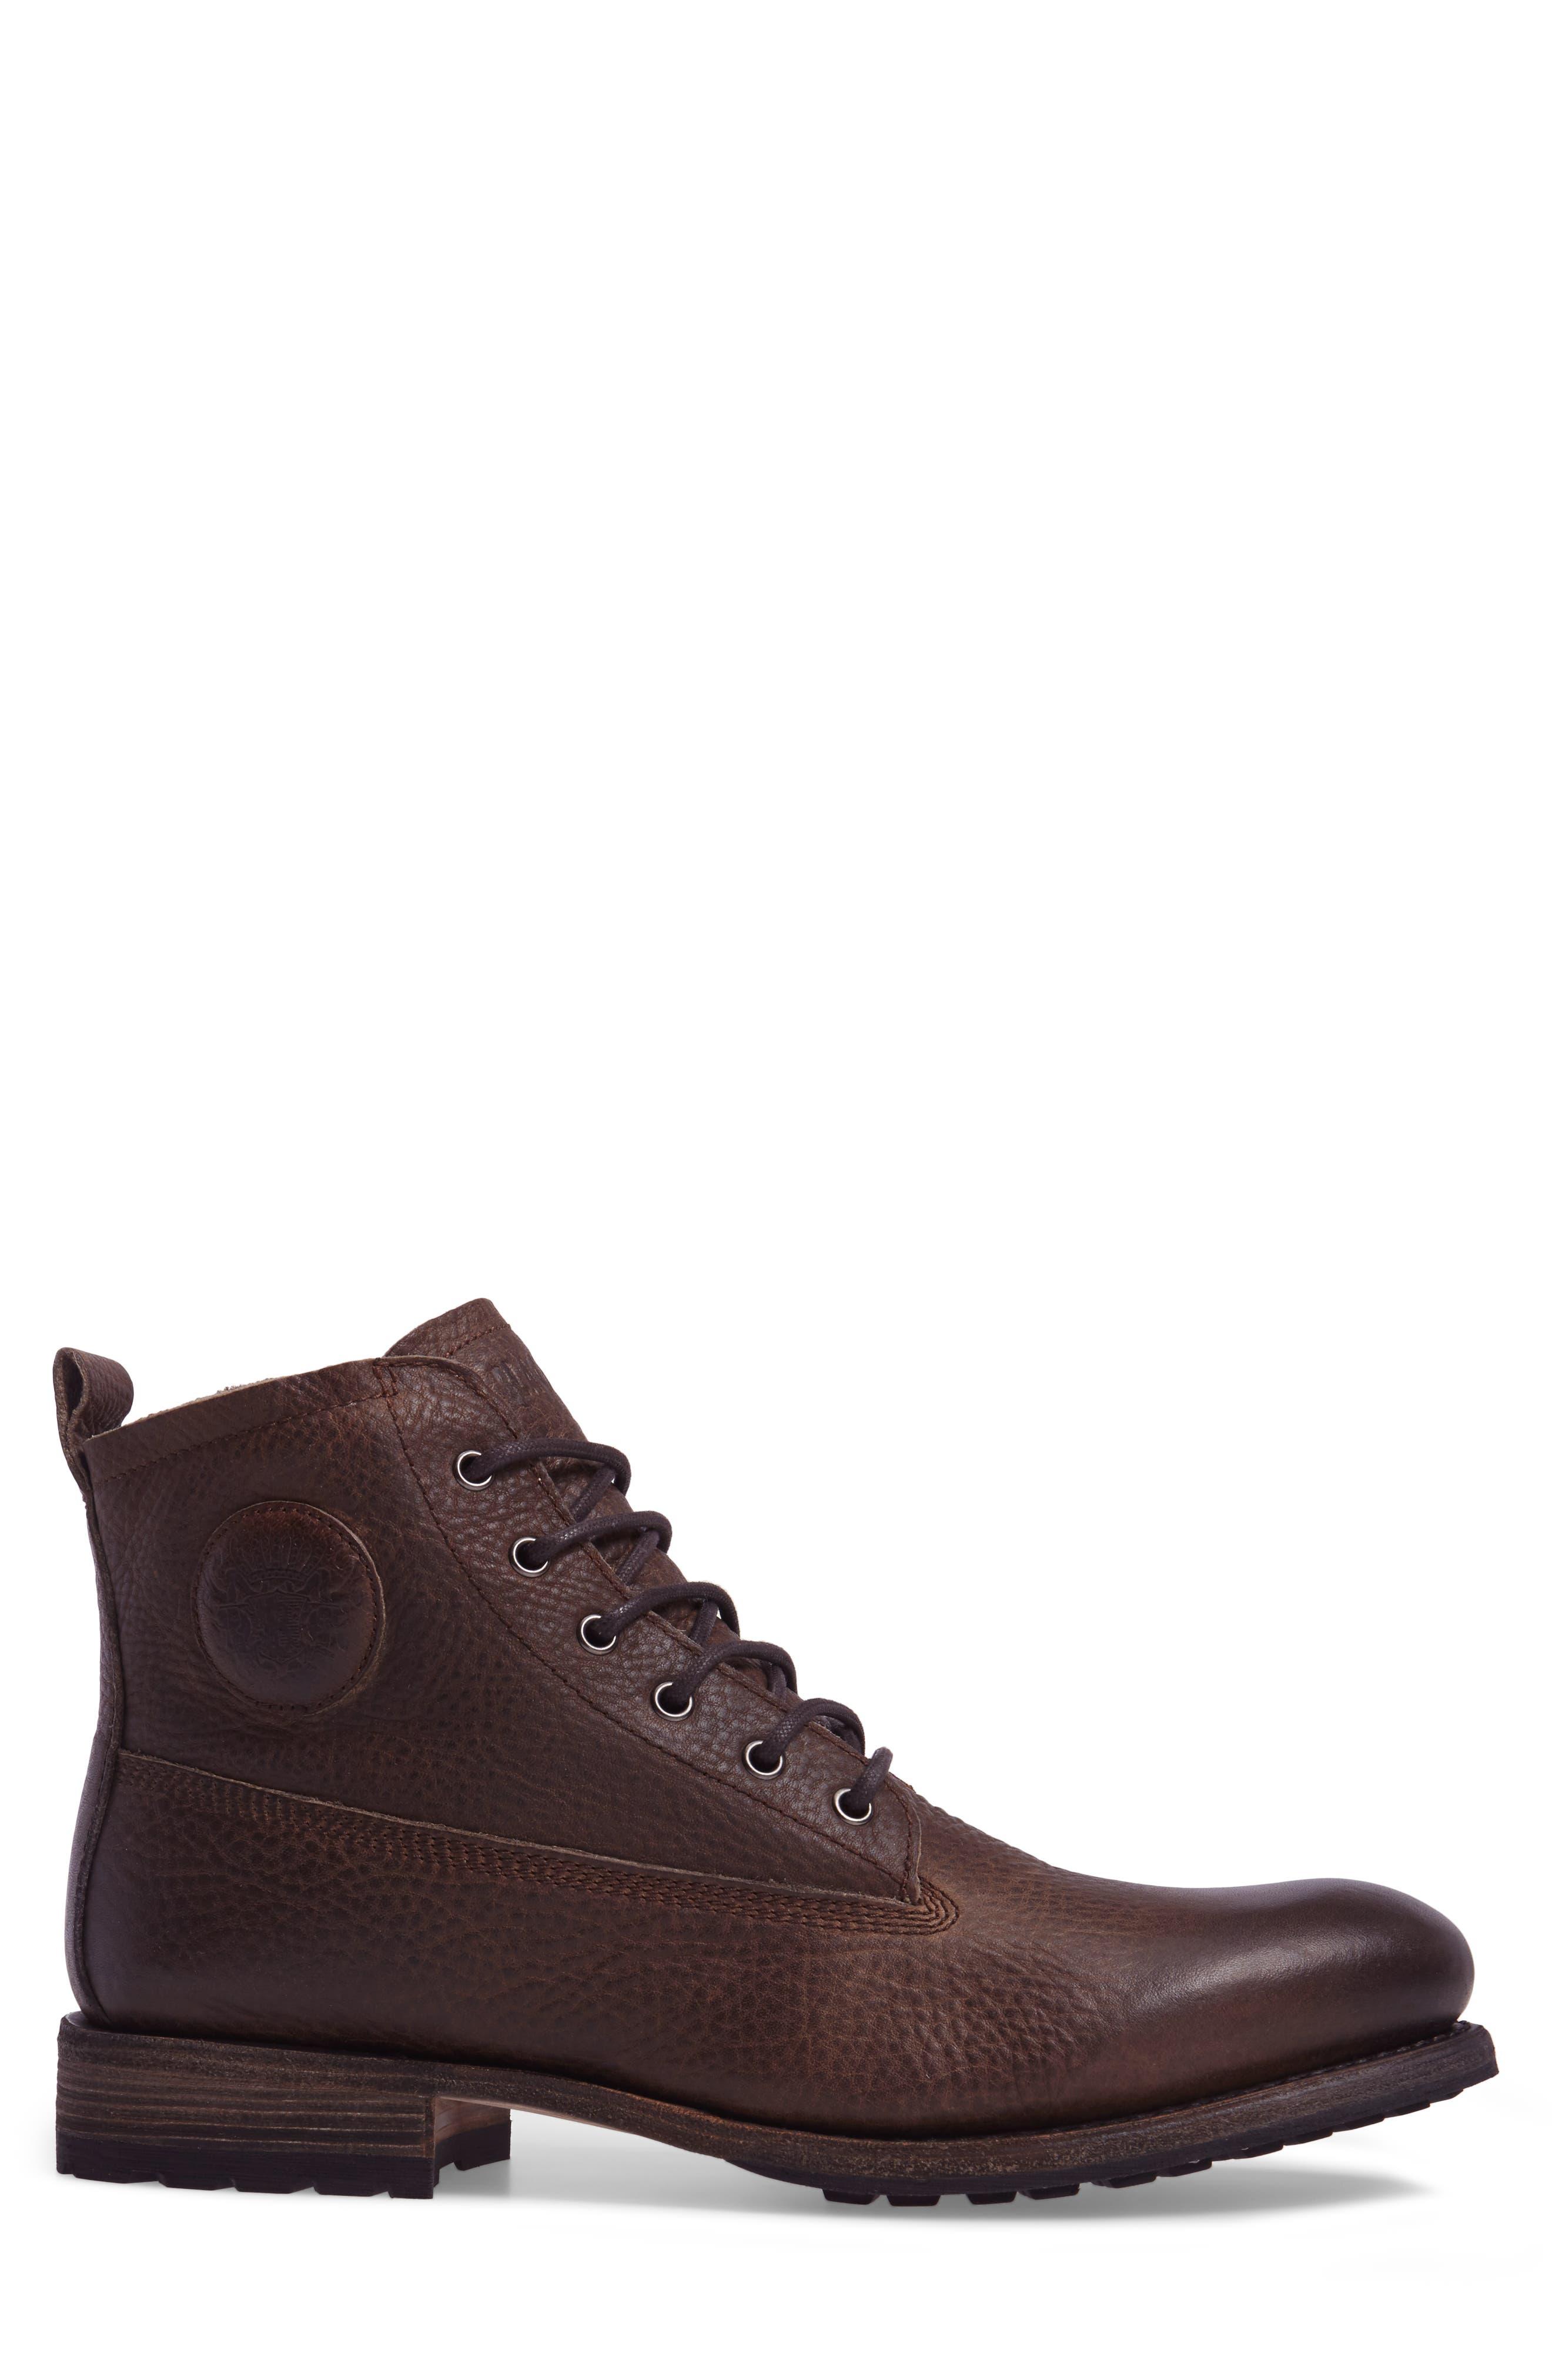 'GM 09' Plain Toe Boot,                             Alternate thumbnail 3, color,                             Gull Leather